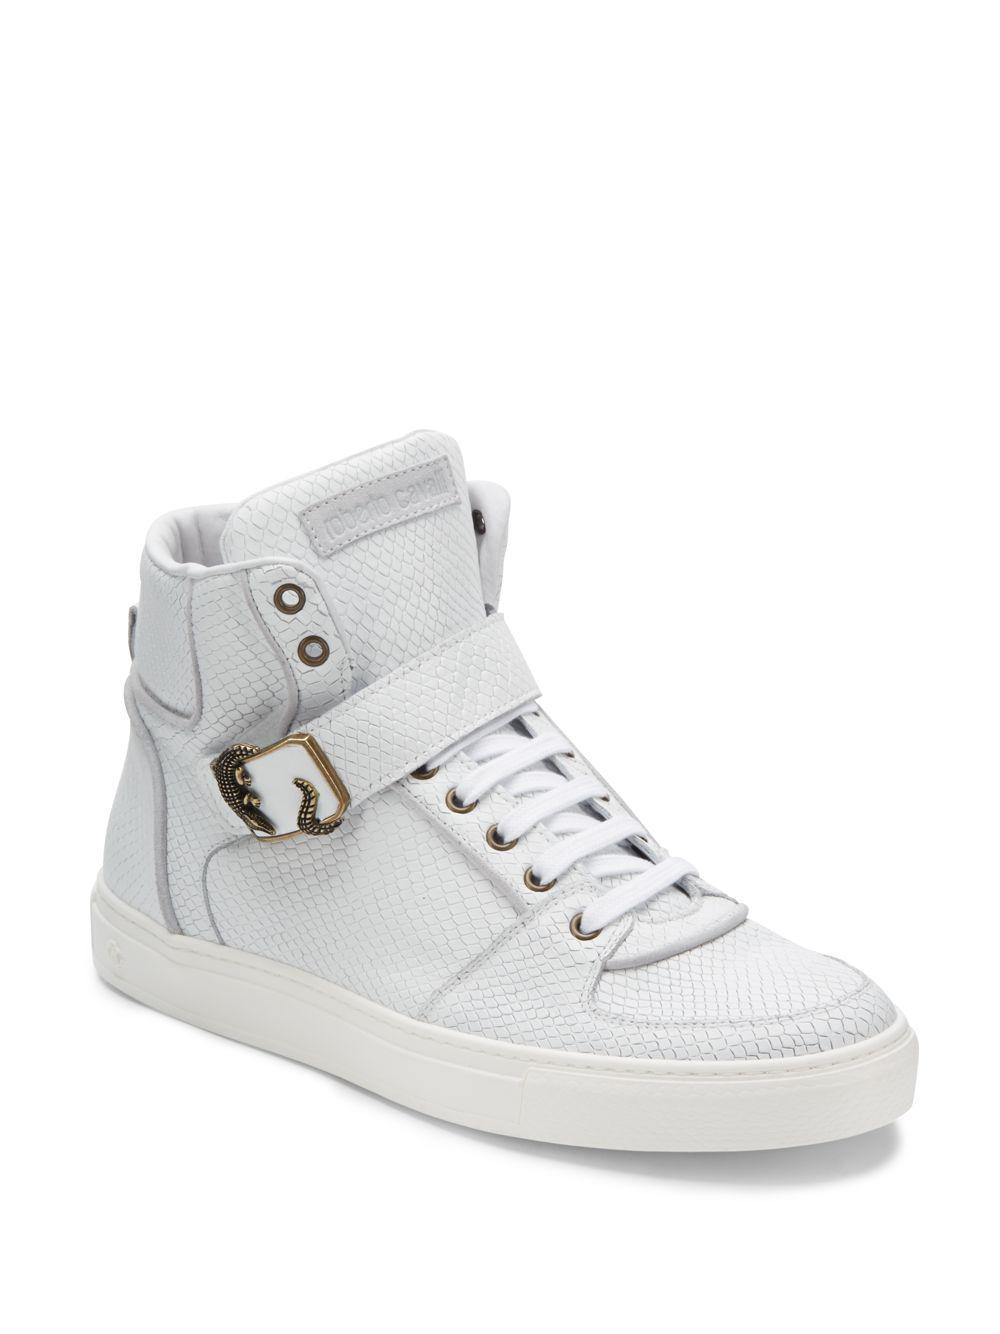 80d03ffe32b Roberto Cavalli White High-top Sneakers for men